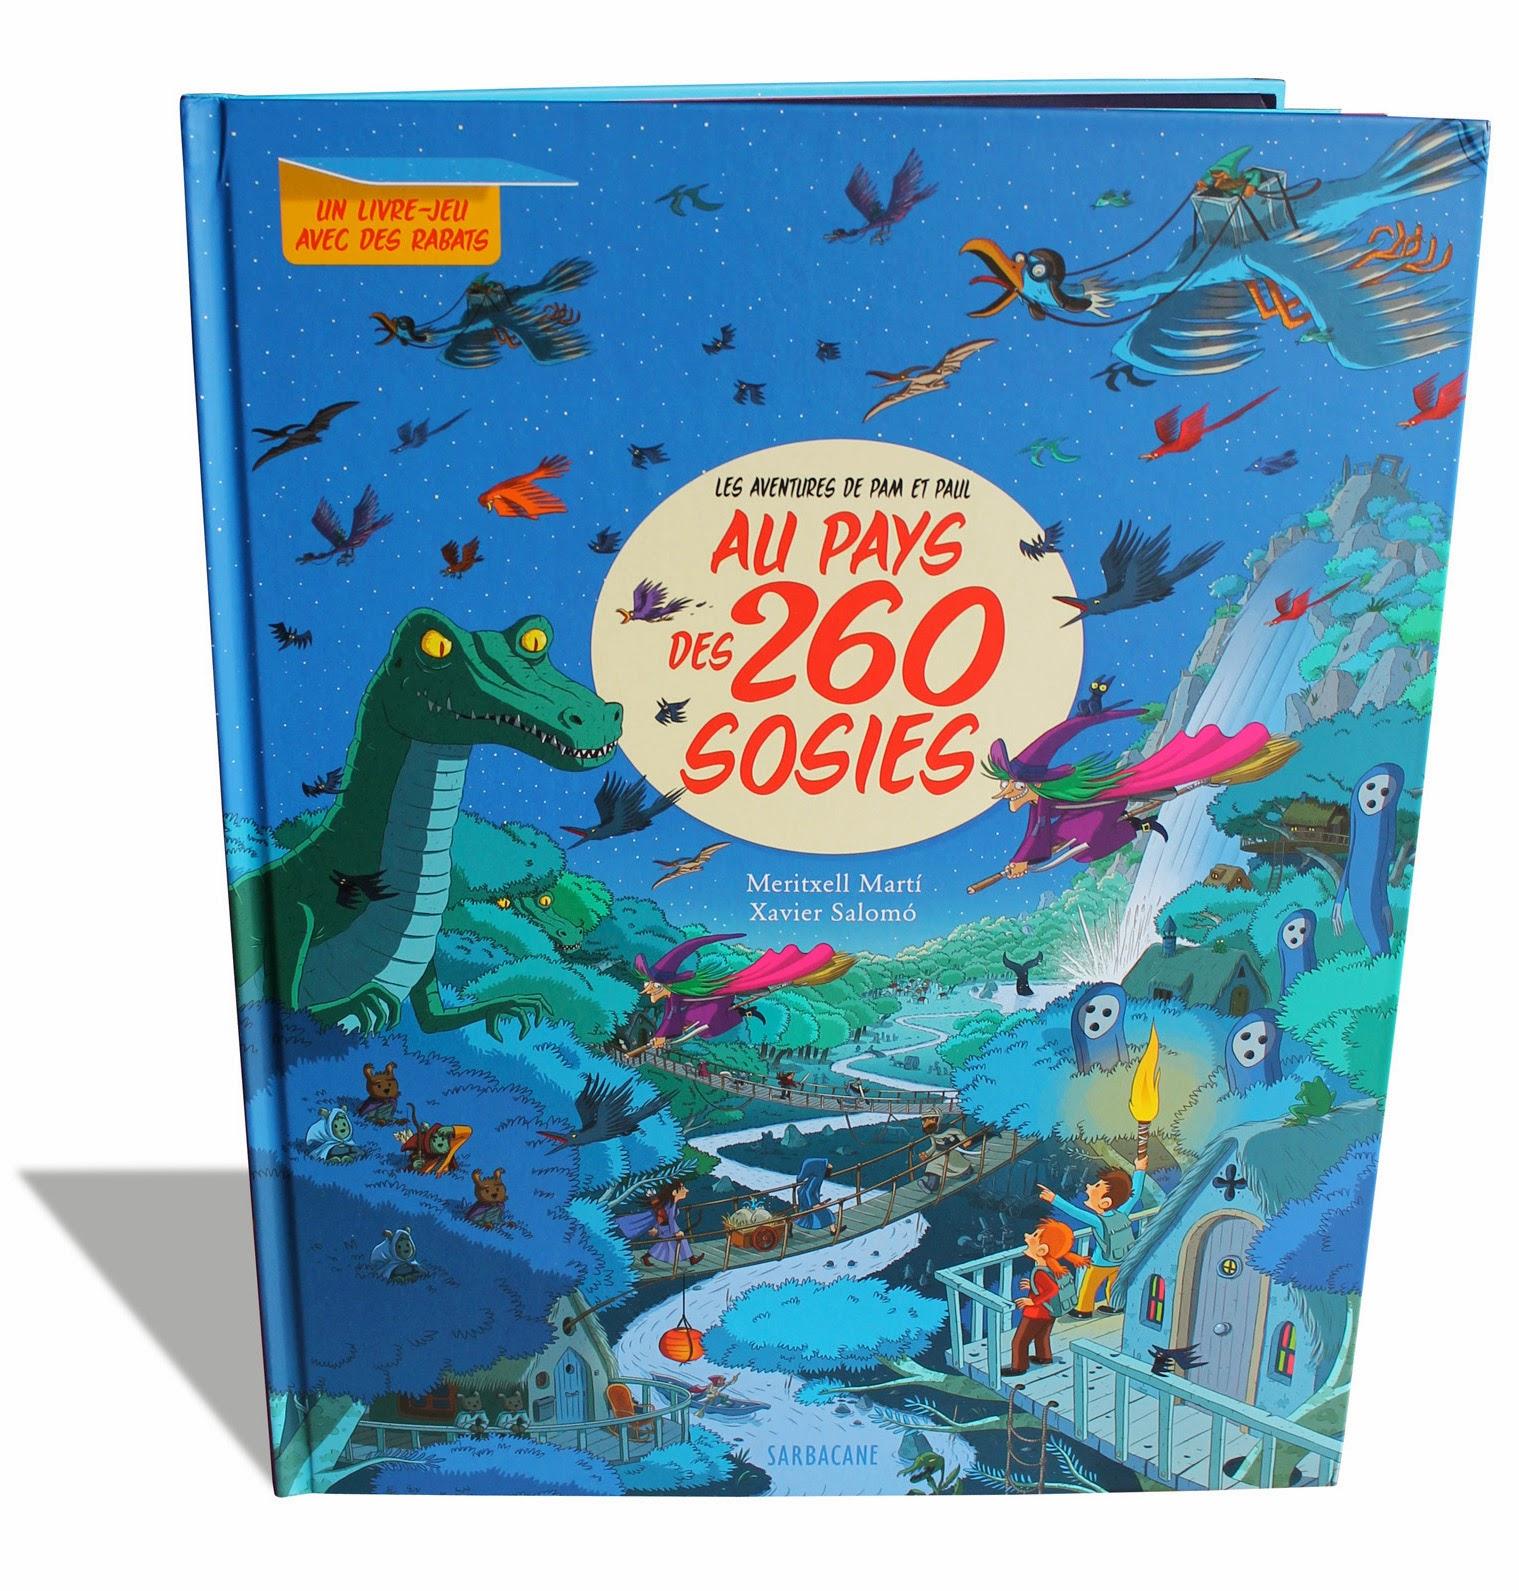 AU PAYS DES 260 SOSIES